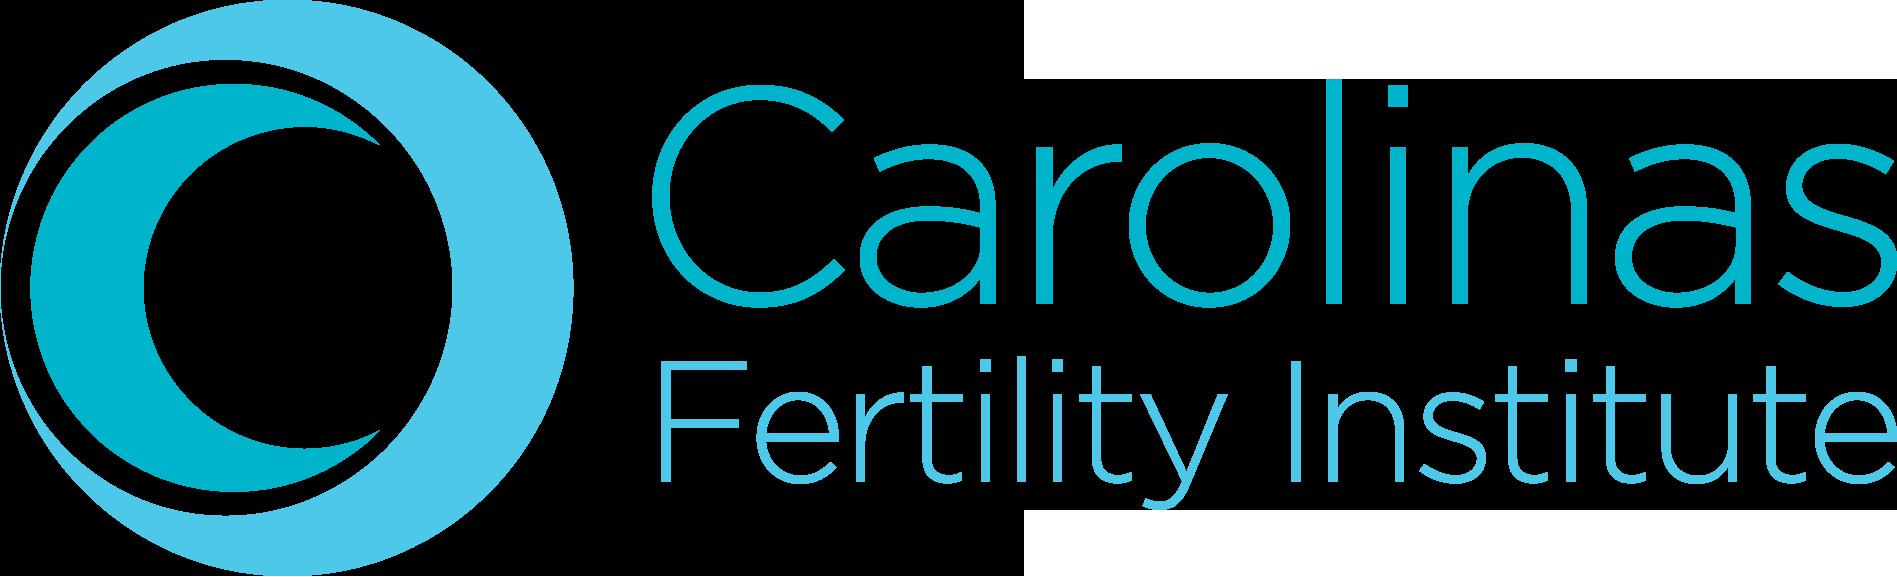 Carolinas Fertility Institute